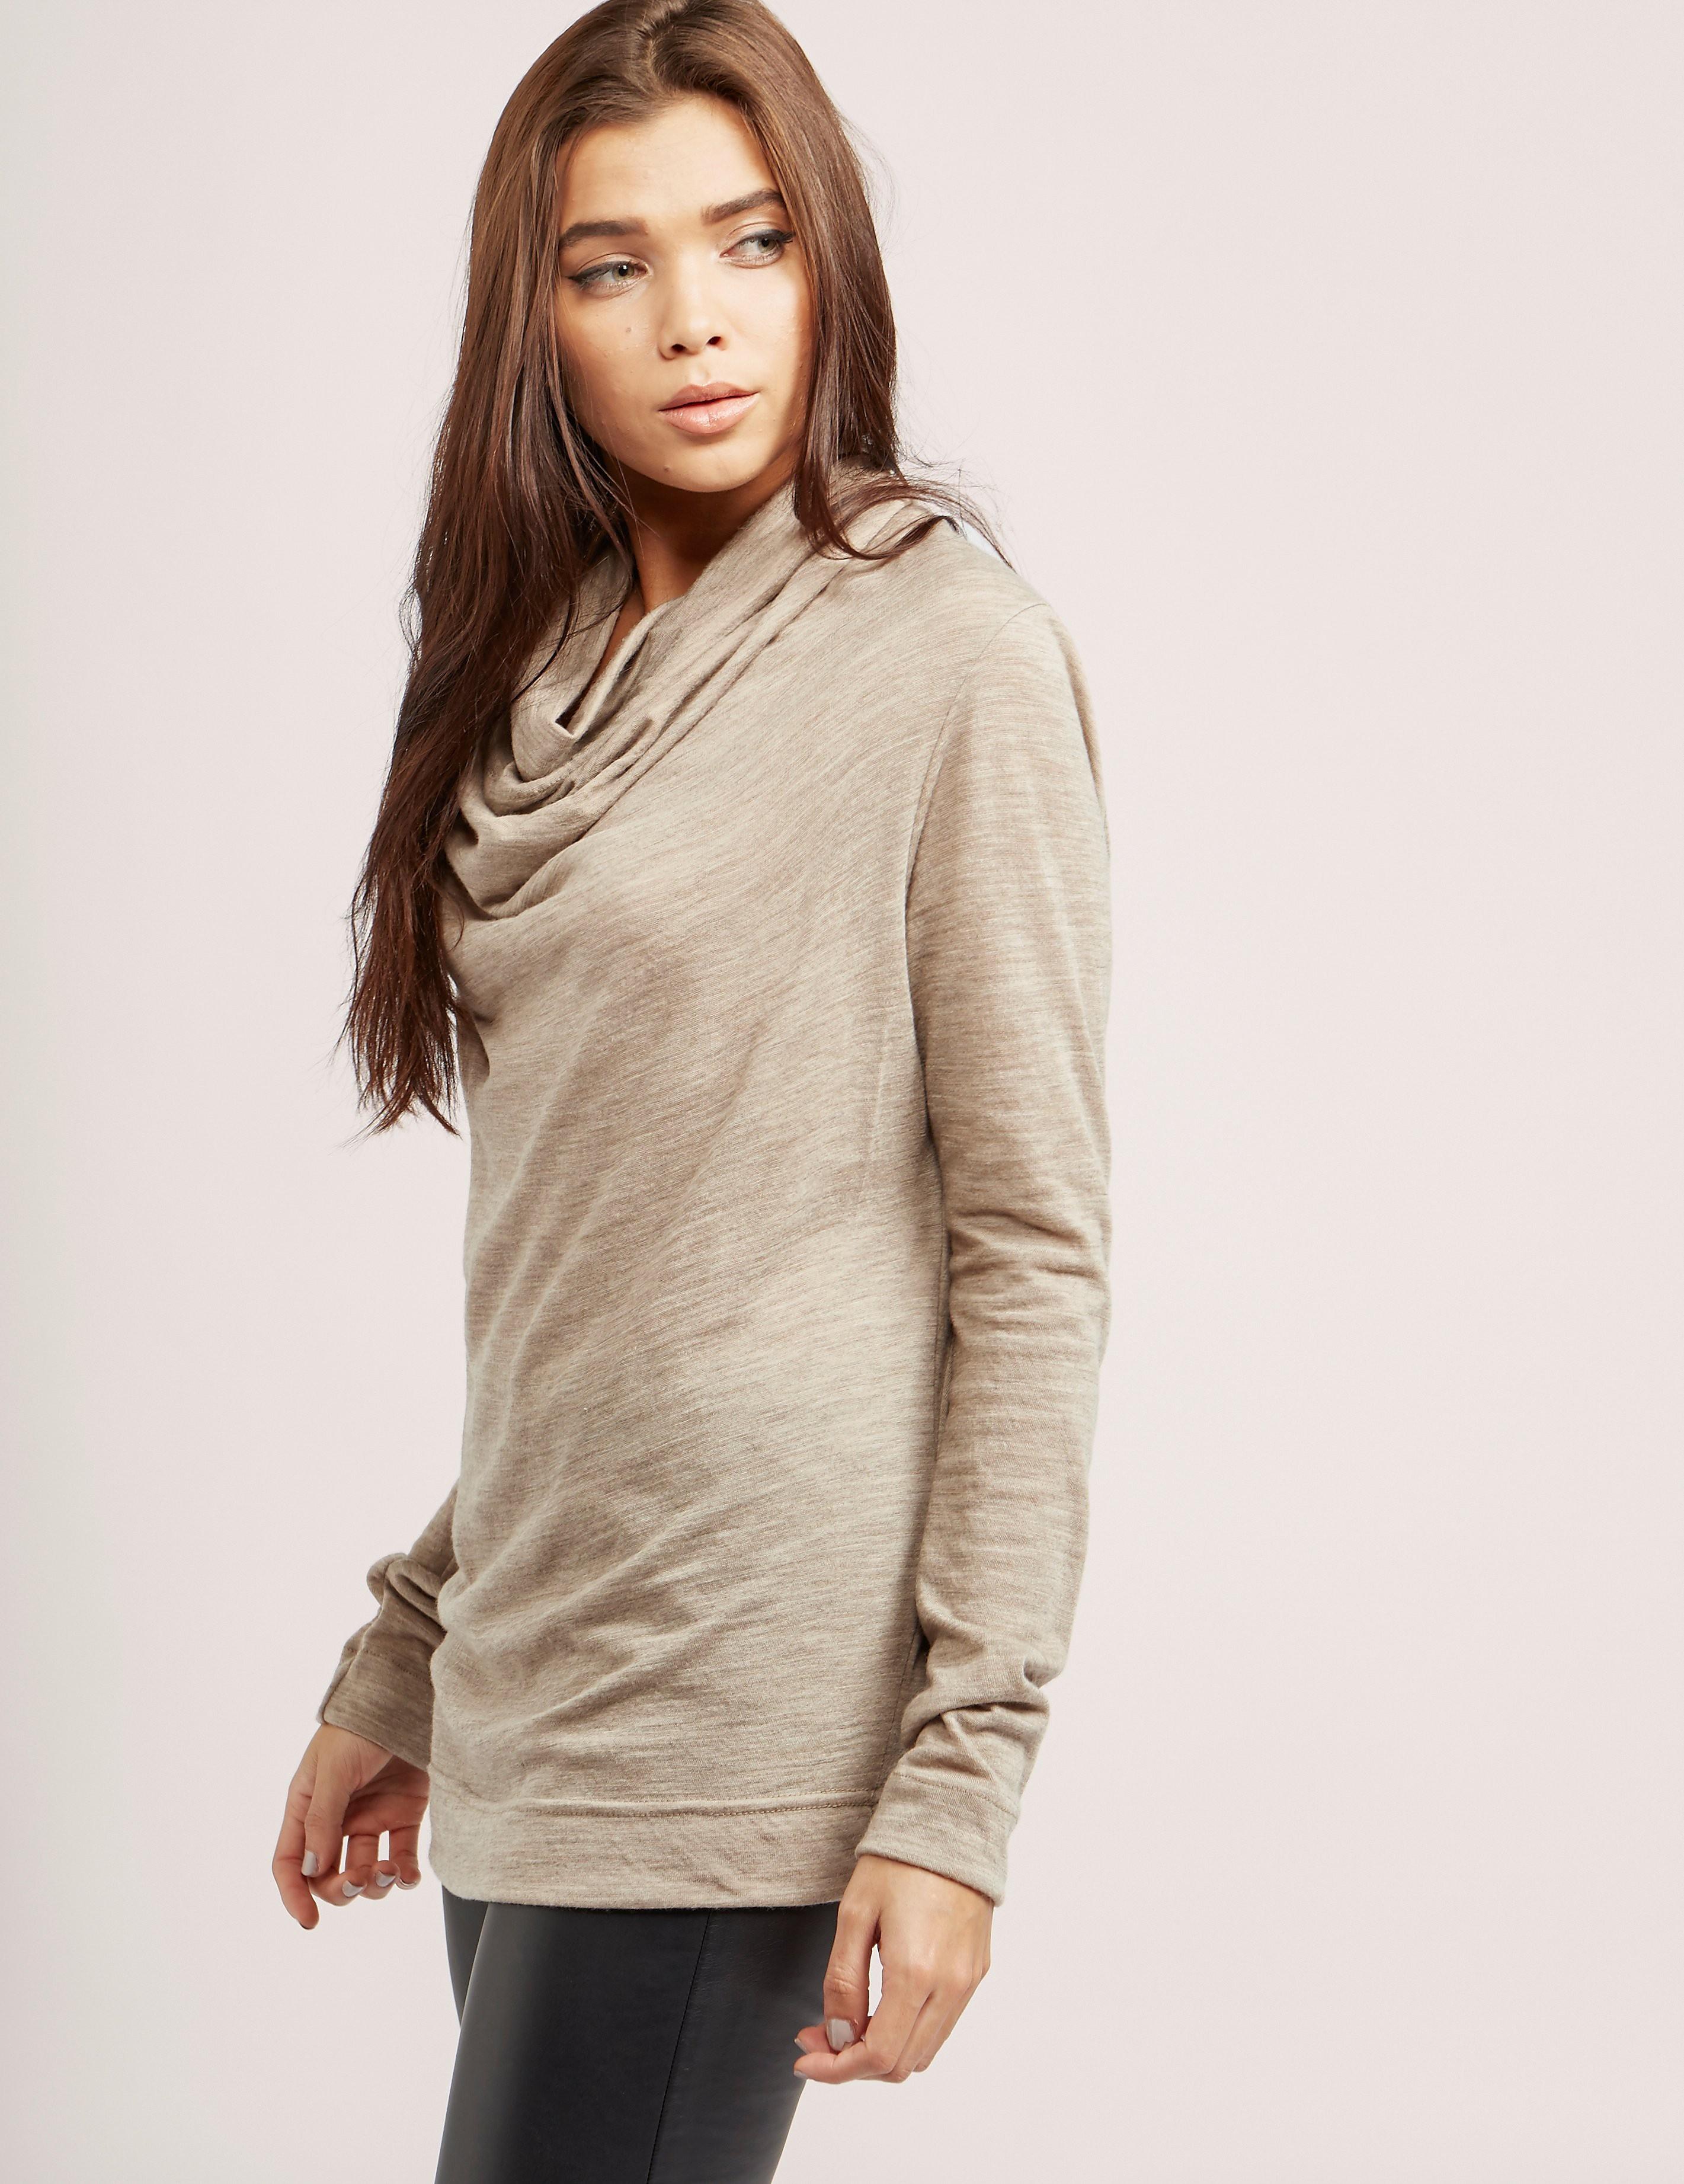 Vivienne Westwood Anglomania Fold Shirt